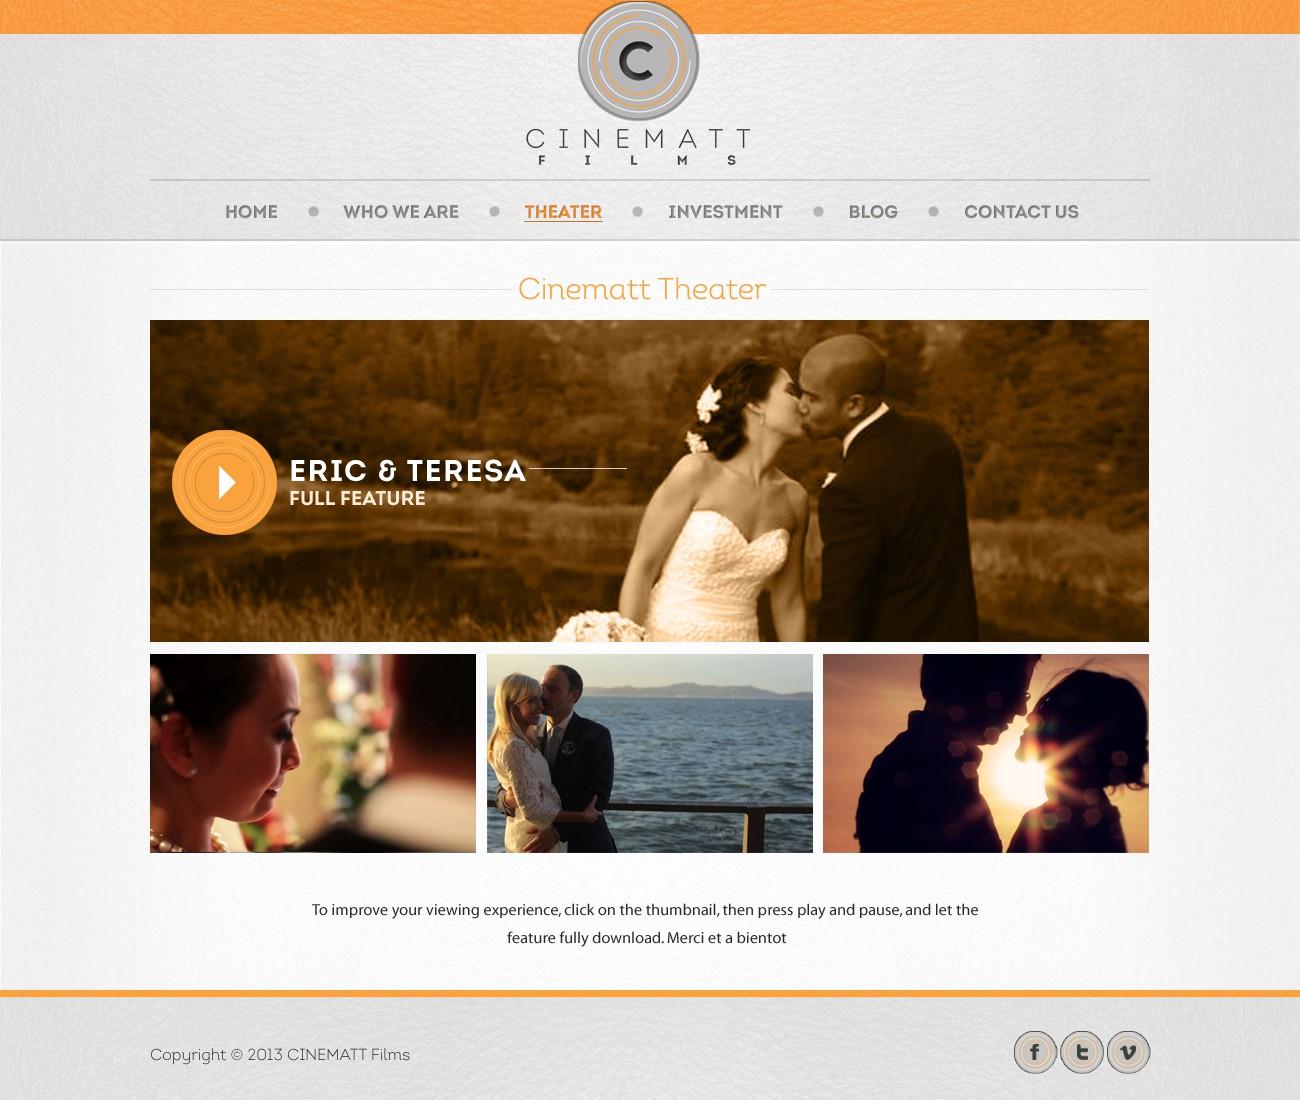 New website design wanted for cinematt